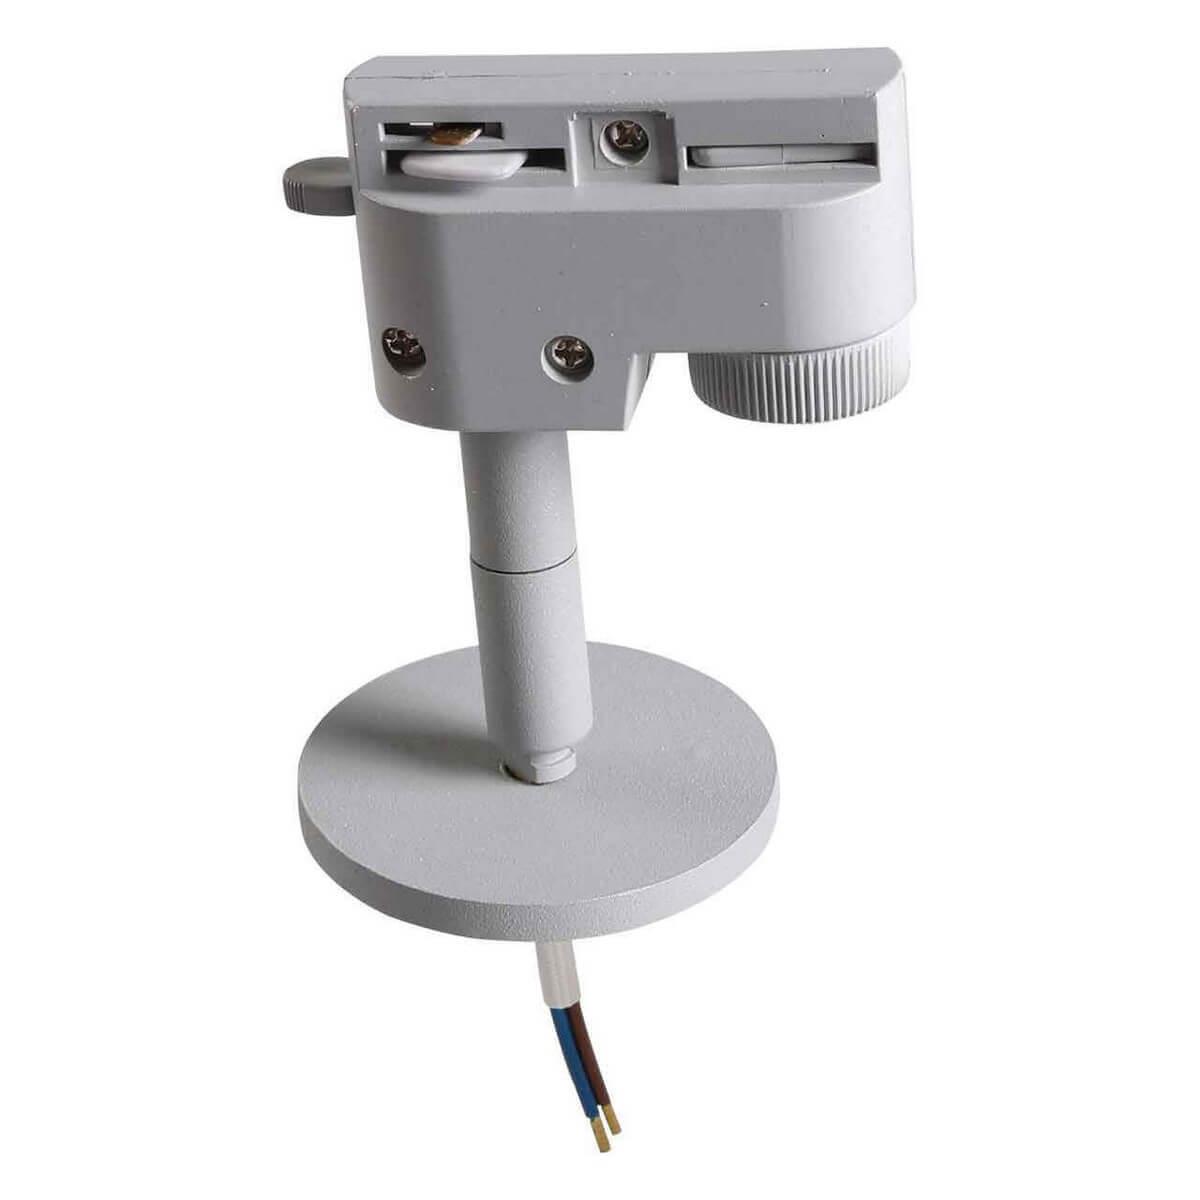 Адаптер для шинопровода Lightstar 592059 Asta Gray (для однофазного шинопровода)